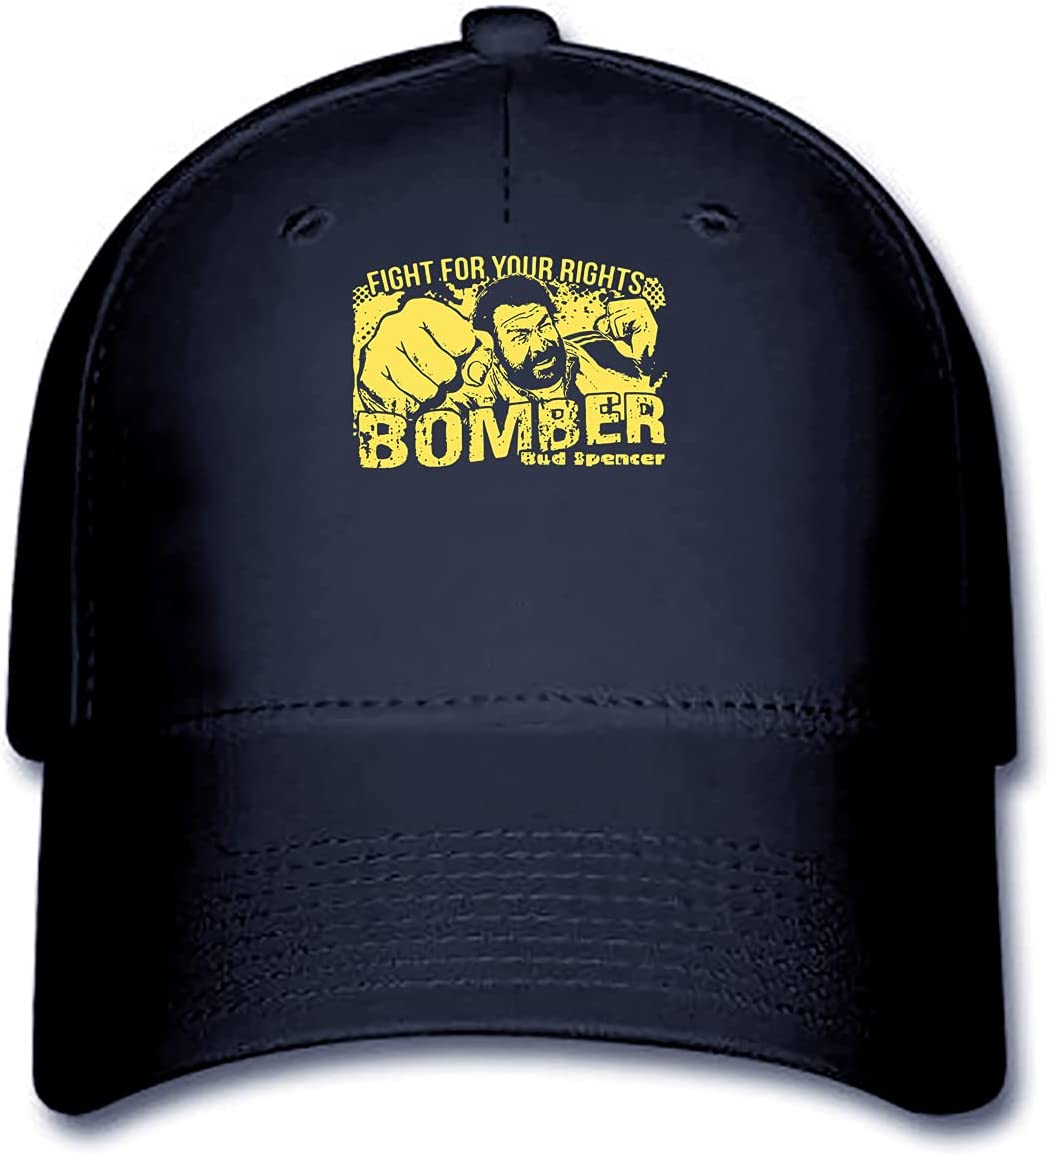 Bomber Bud Spencer Jerry Cala Box Mans Baseball Cap Hat Design Baseball Caps Soft Women Baseball Cap Baseball Cap 7006